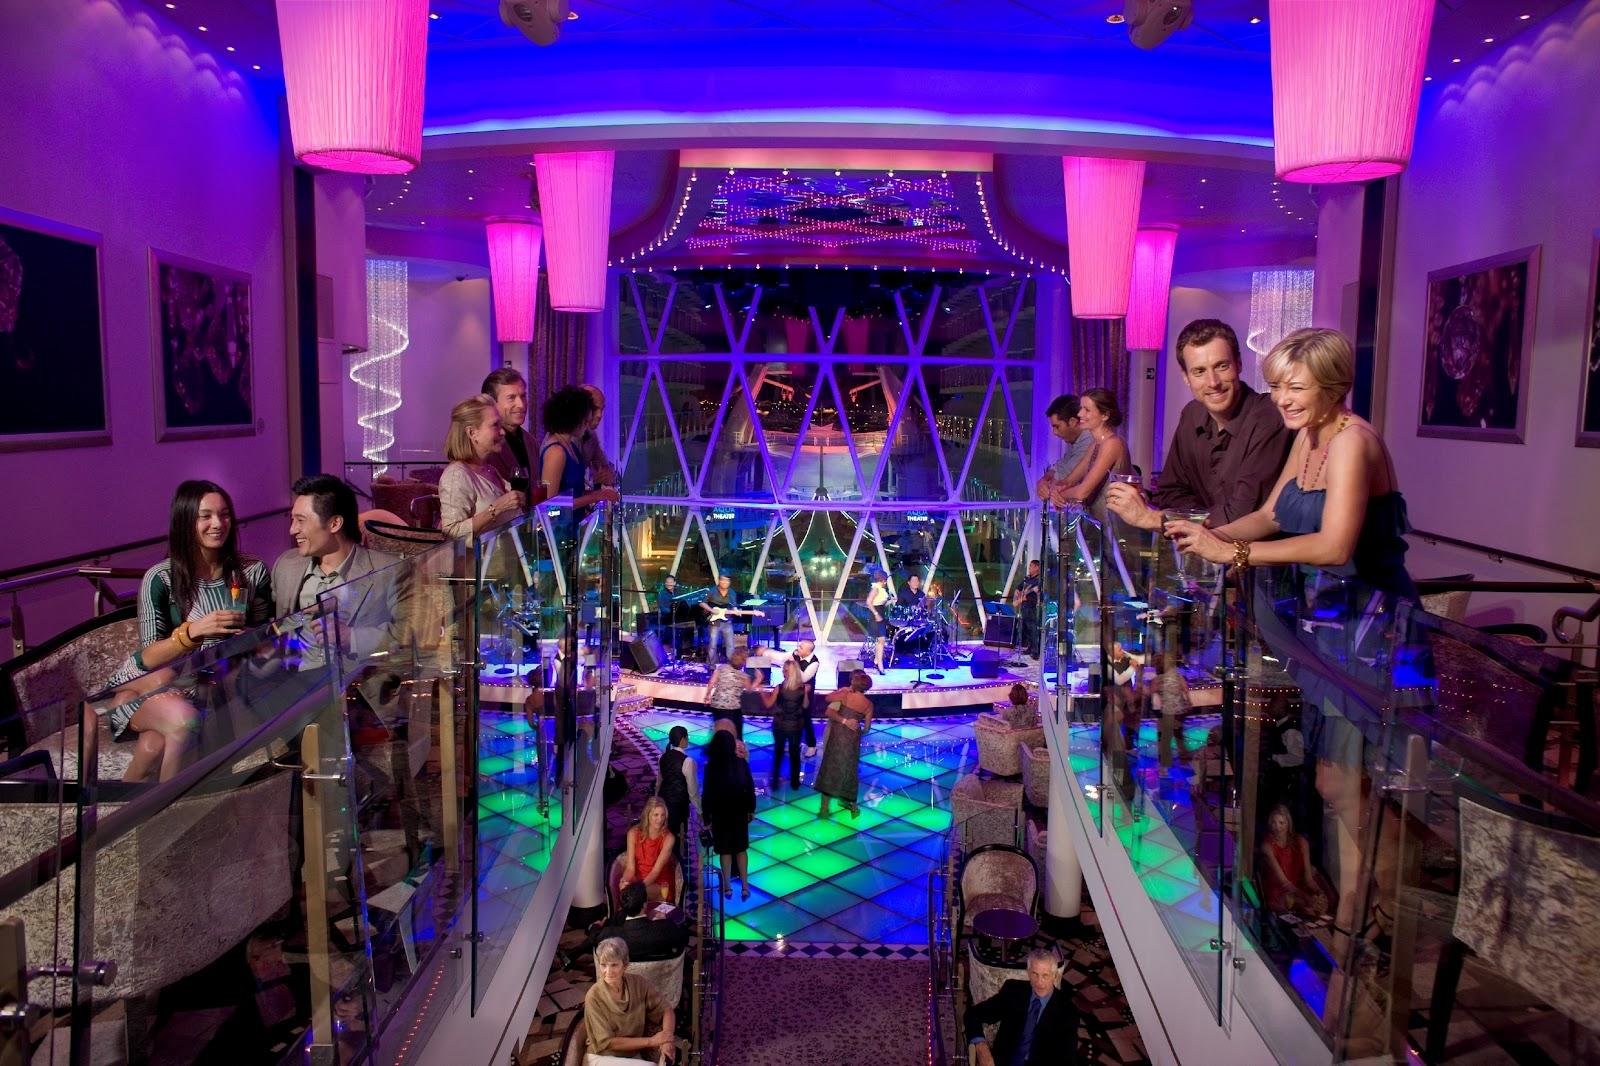 Royal Caribbean Arabias Blog Cruise Talk Night Life Onboard A - Jazz cruise ships